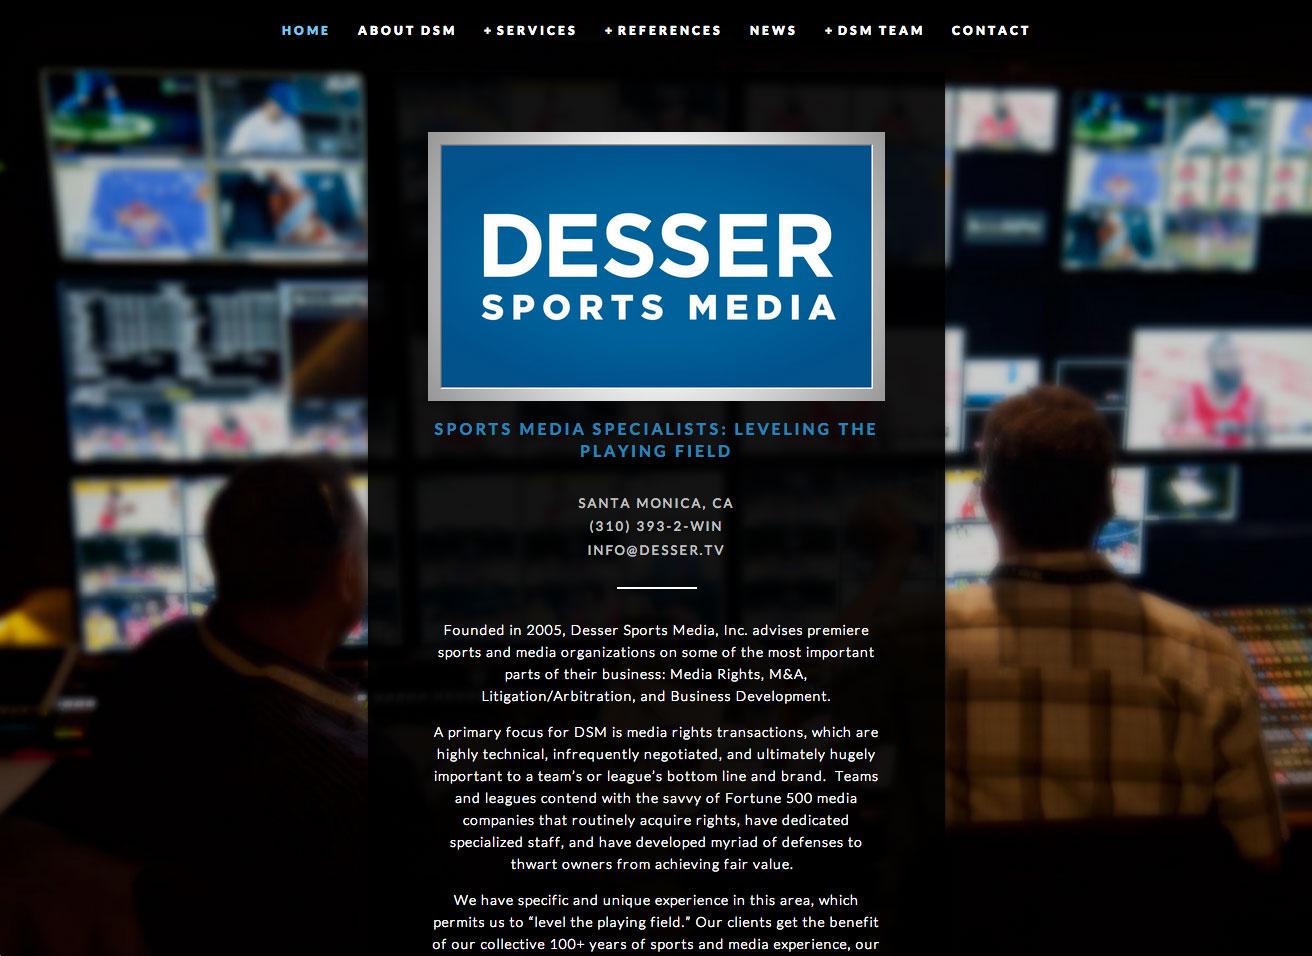 Desser Sports Media - home page